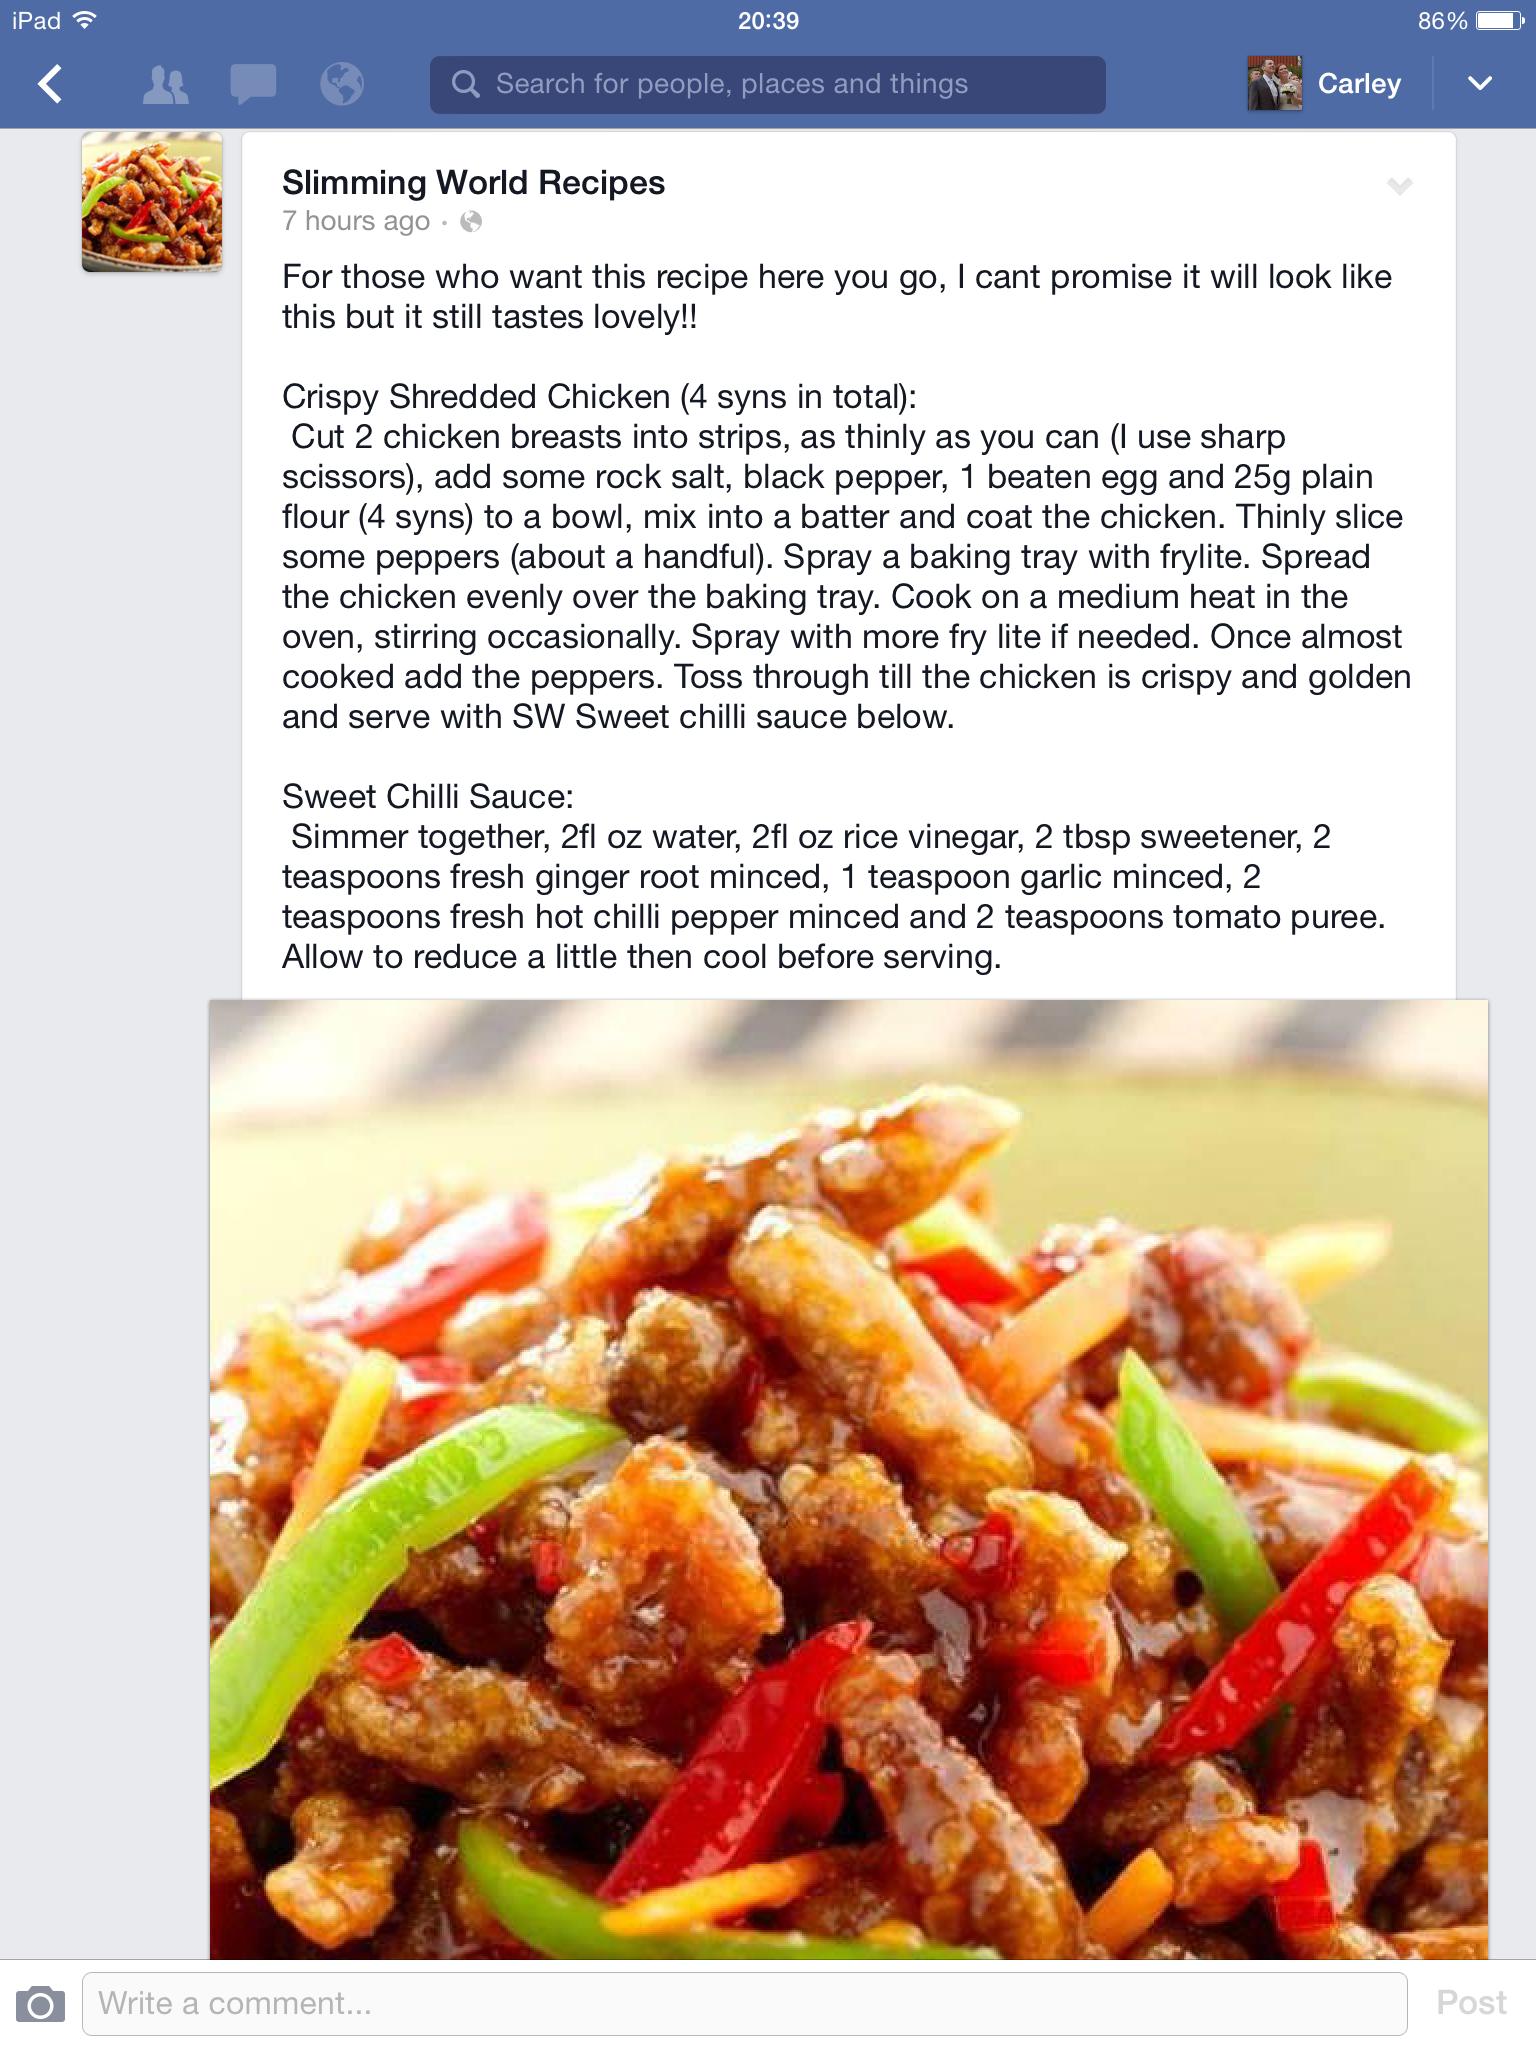 Slimming World Crispy Shredded Chicken 4 Syns World Recipes Slimming World Recipes Crispy Shredded Chicken